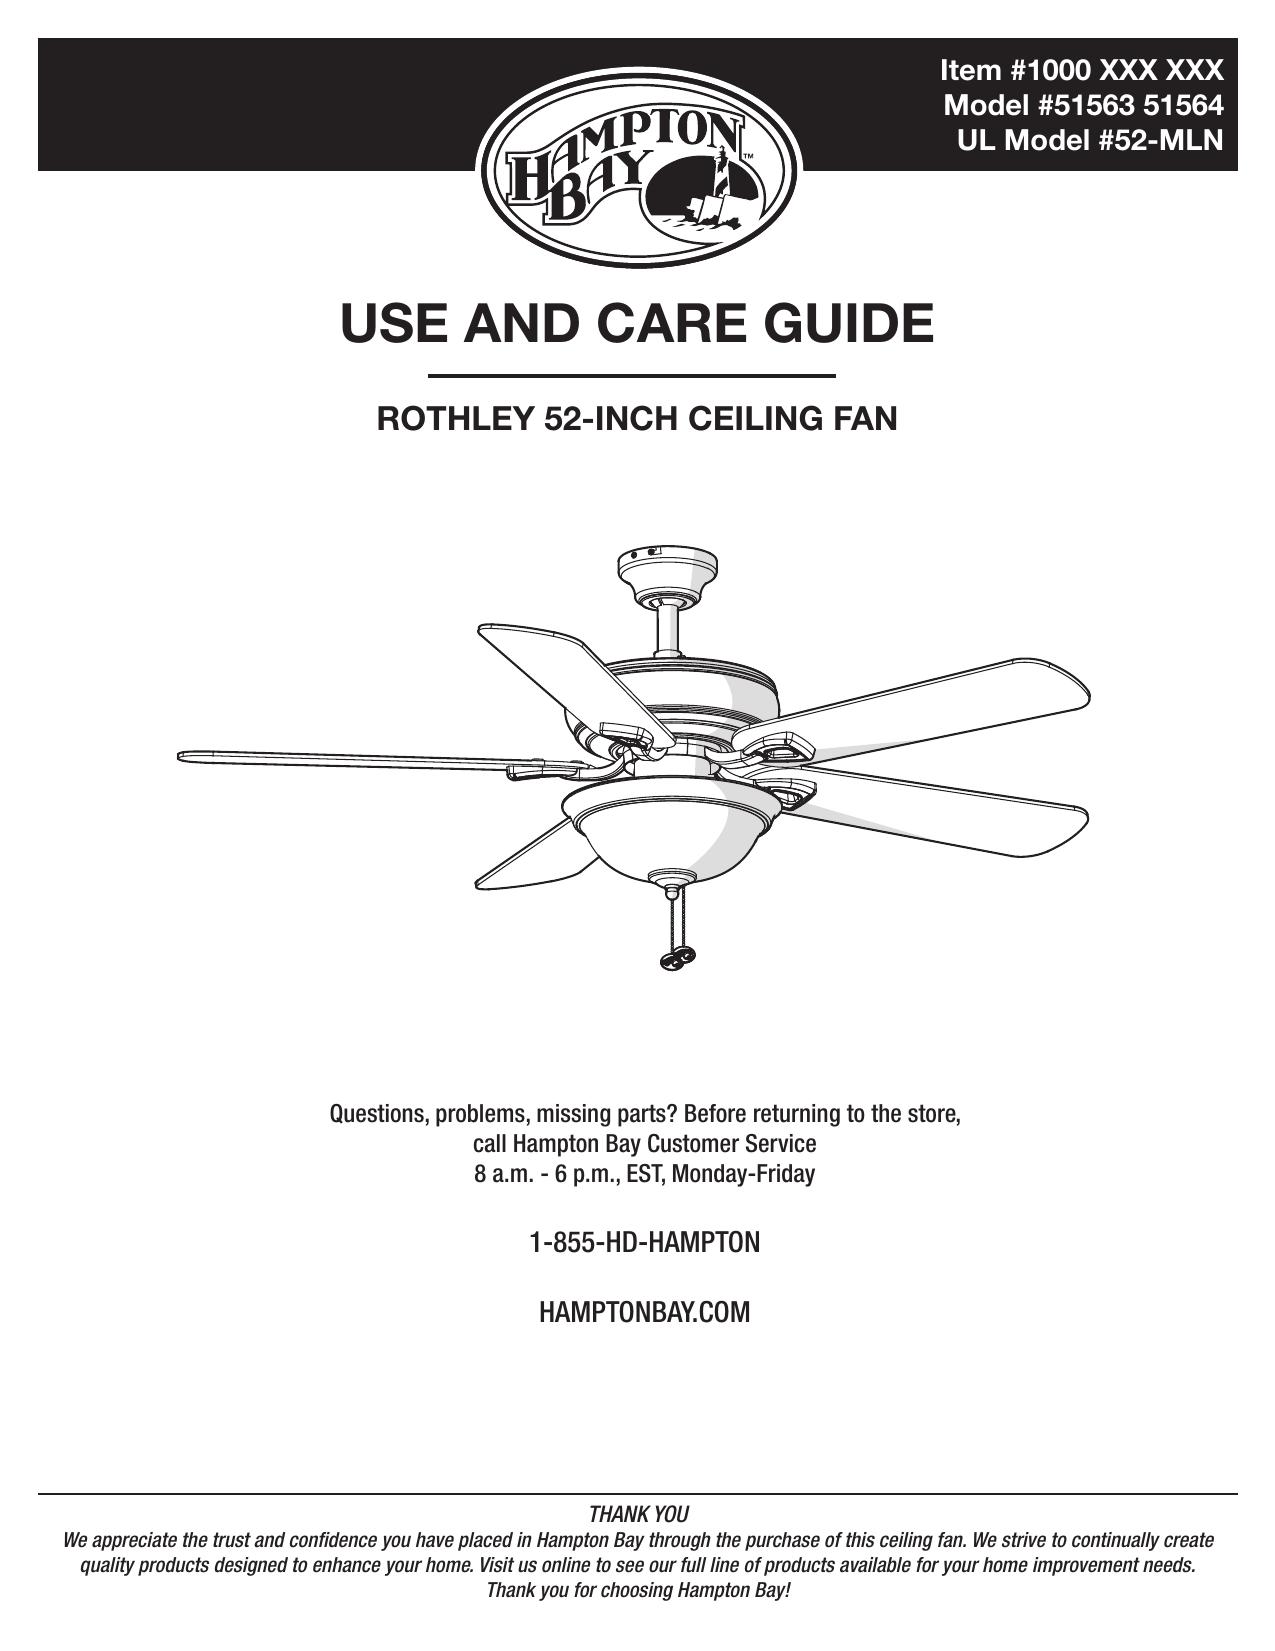 Hampton Bay 51564 Use and Care Manual | manualzz.com on